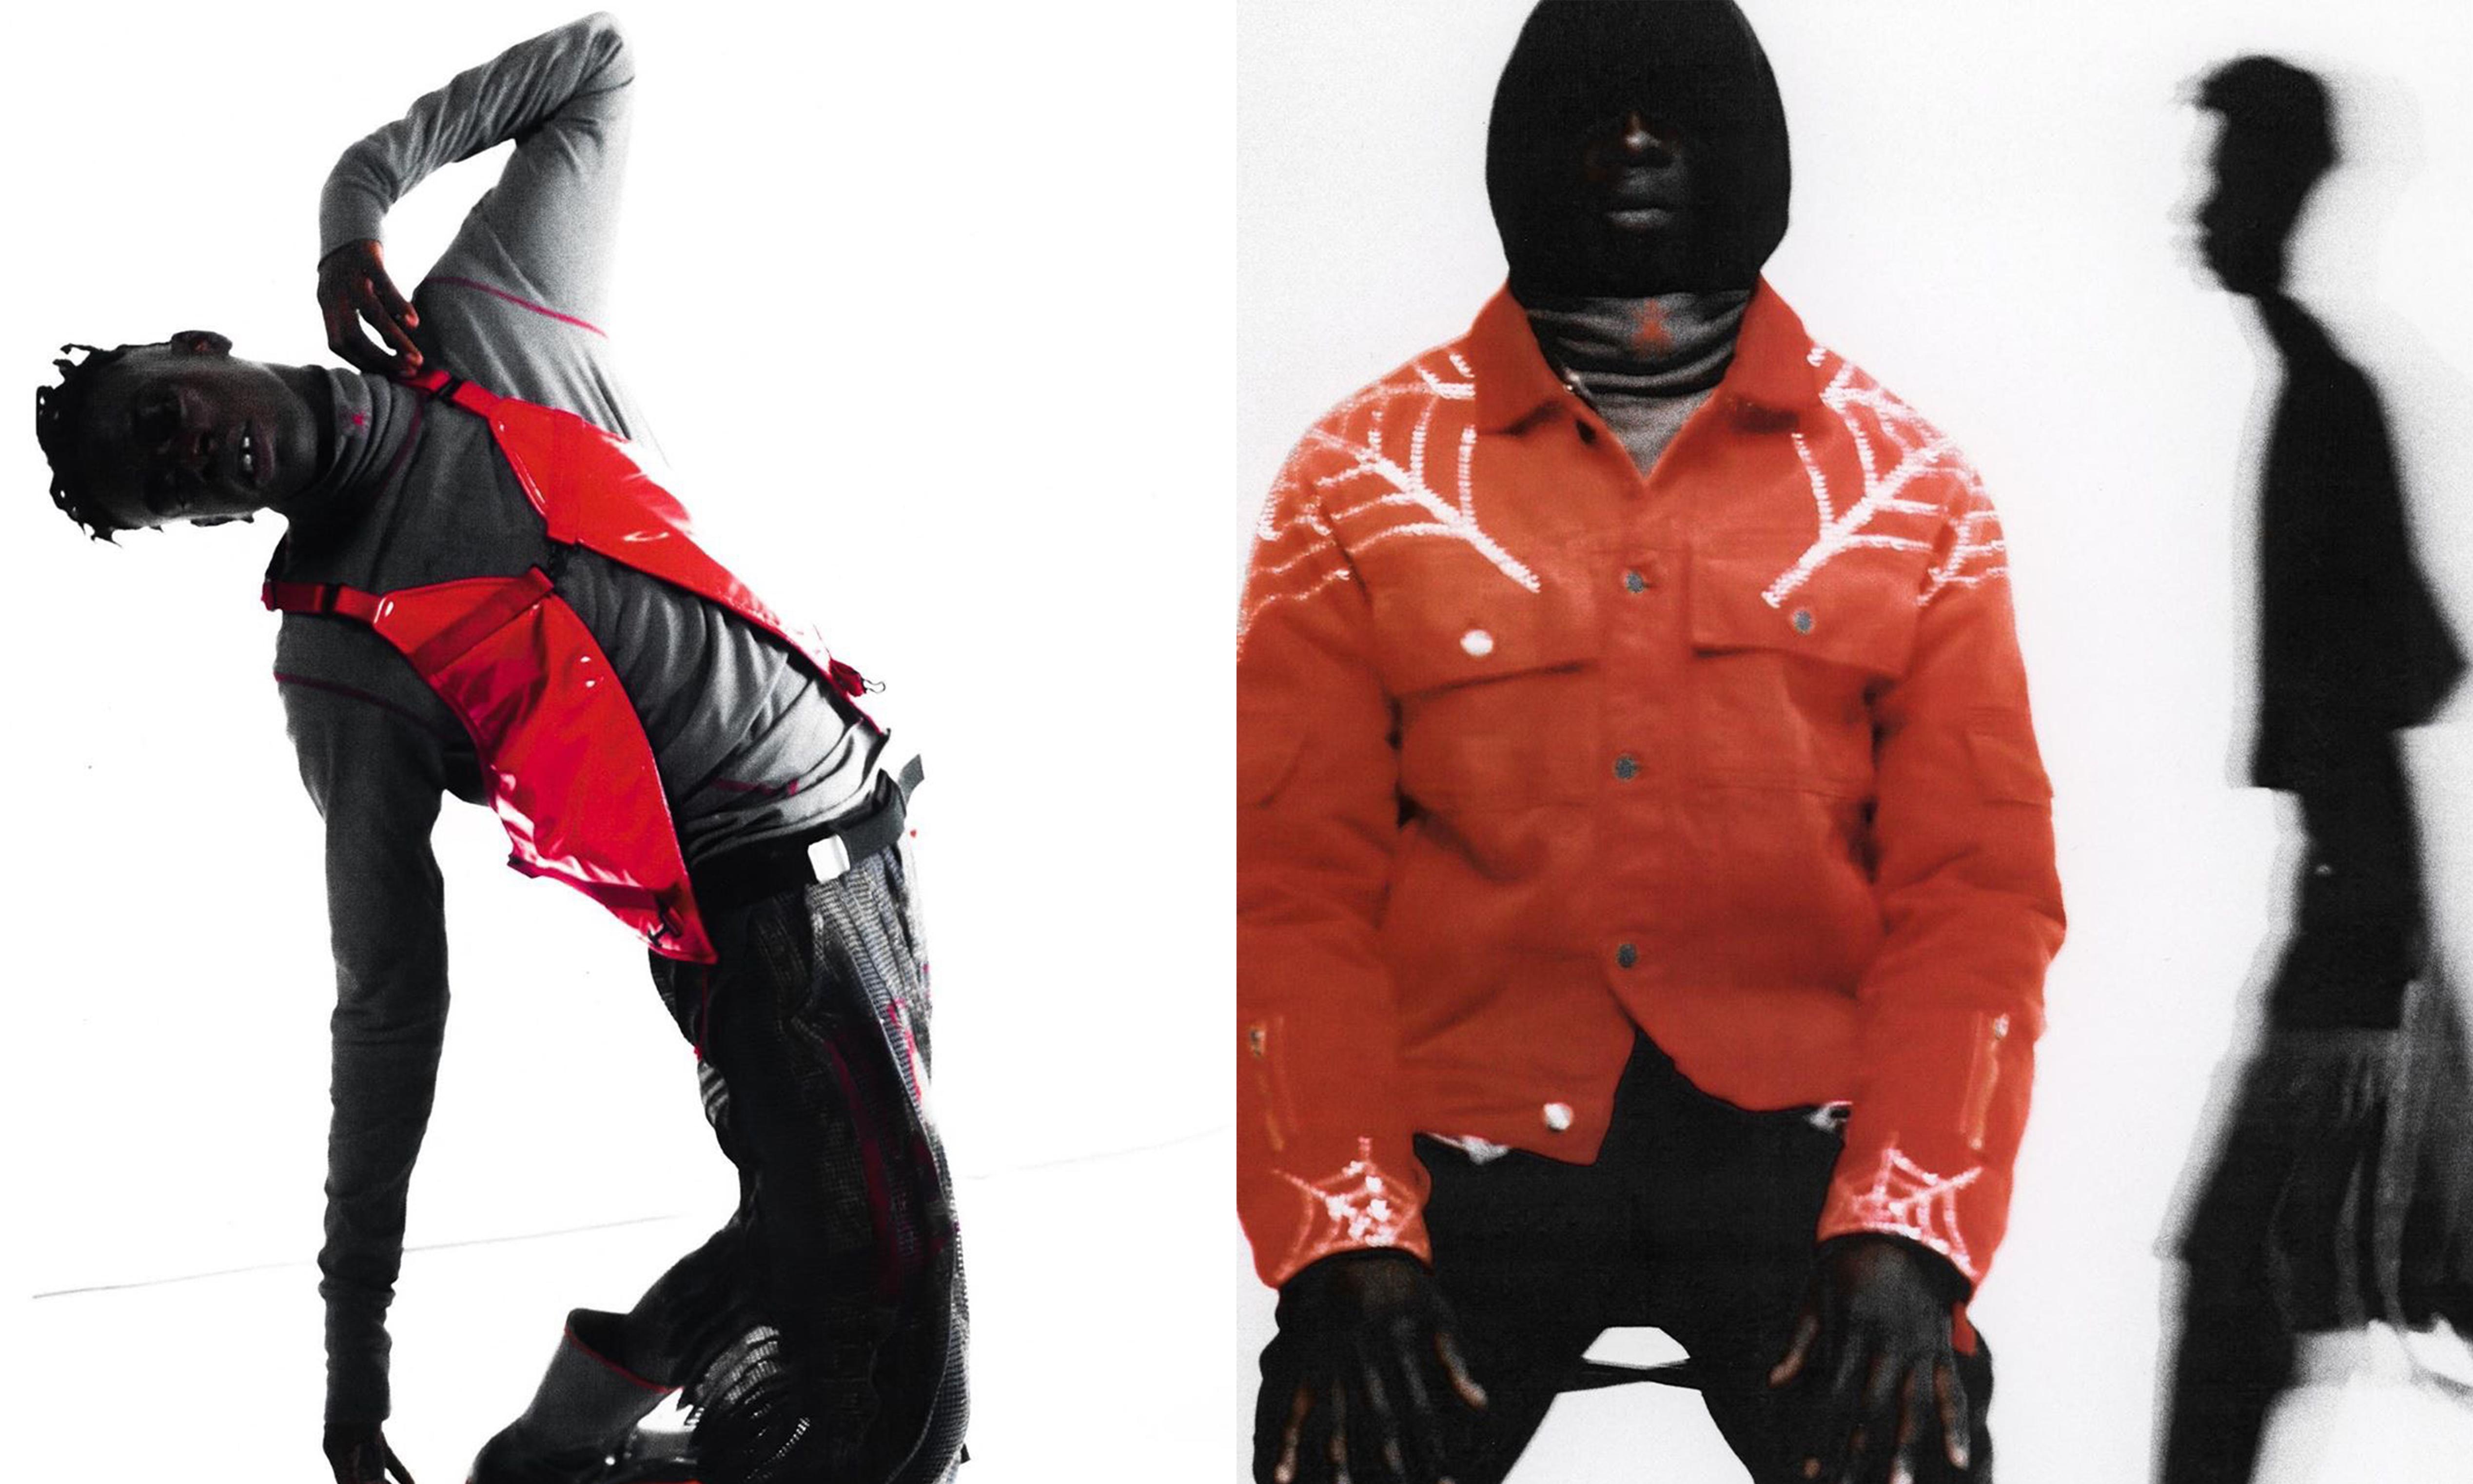 Young Thug 个人服装品牌 SPIDER 将在伦敦首度亮相